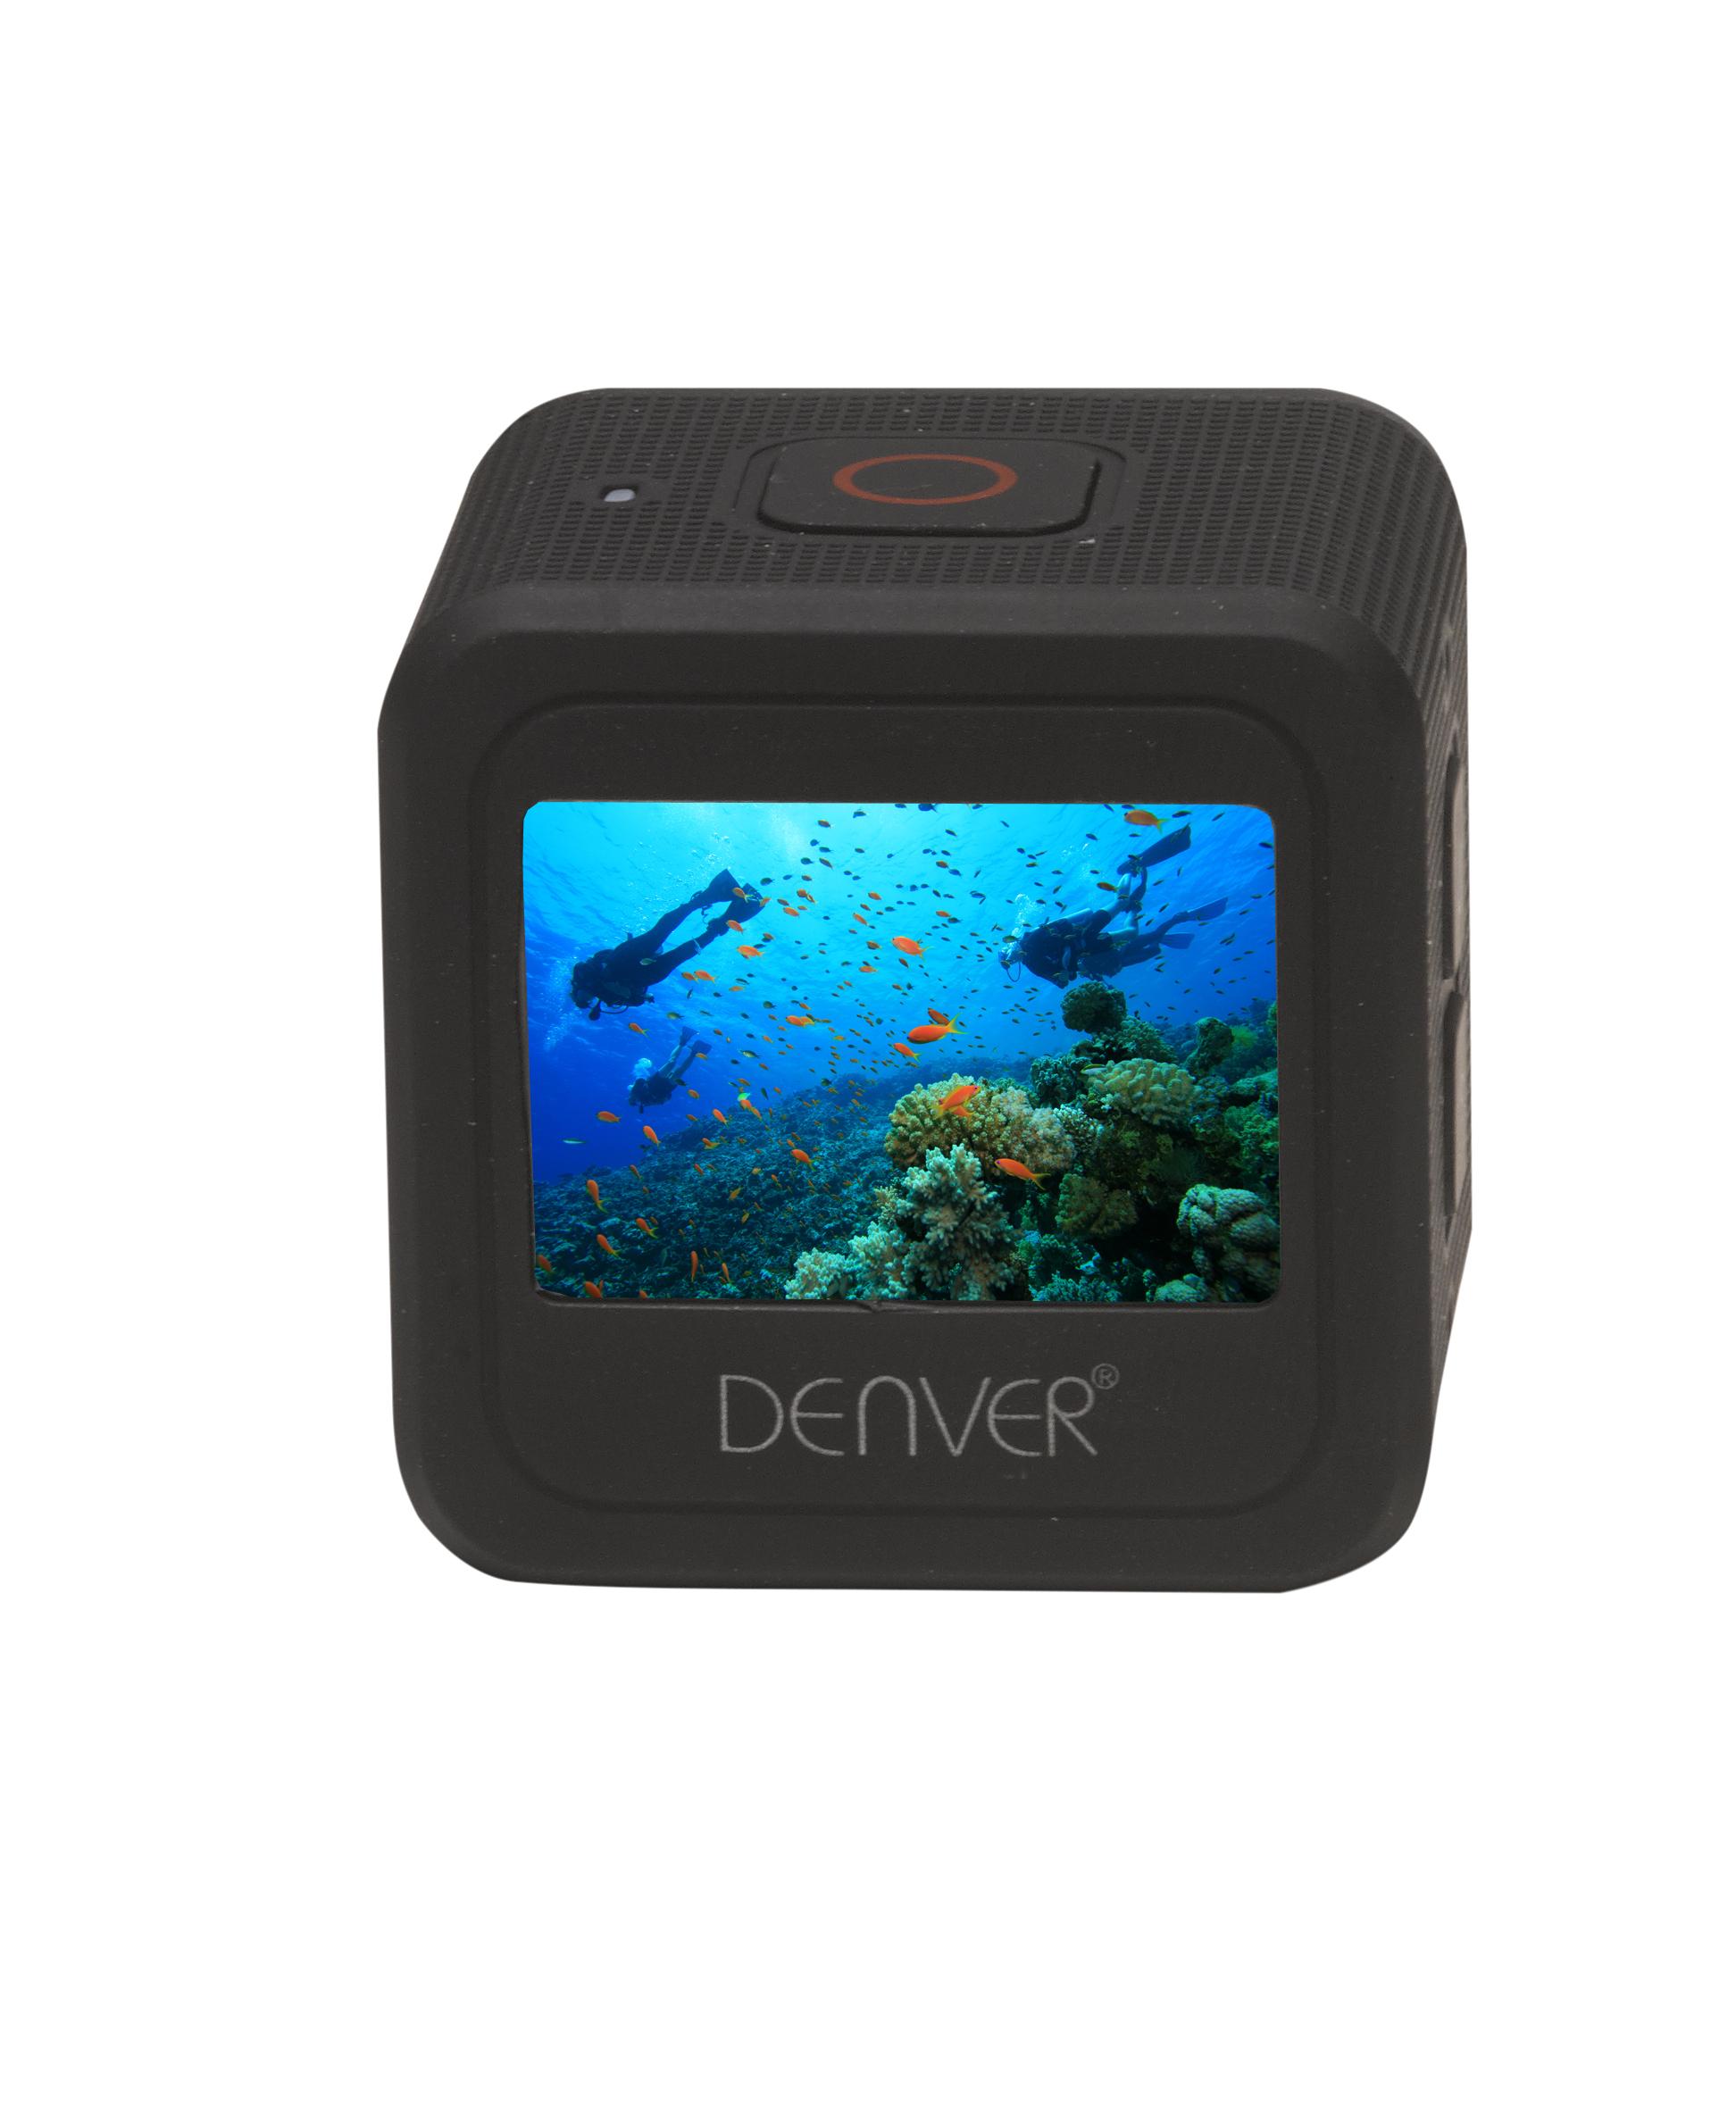 Denver ACT-5040W black sporta kamera